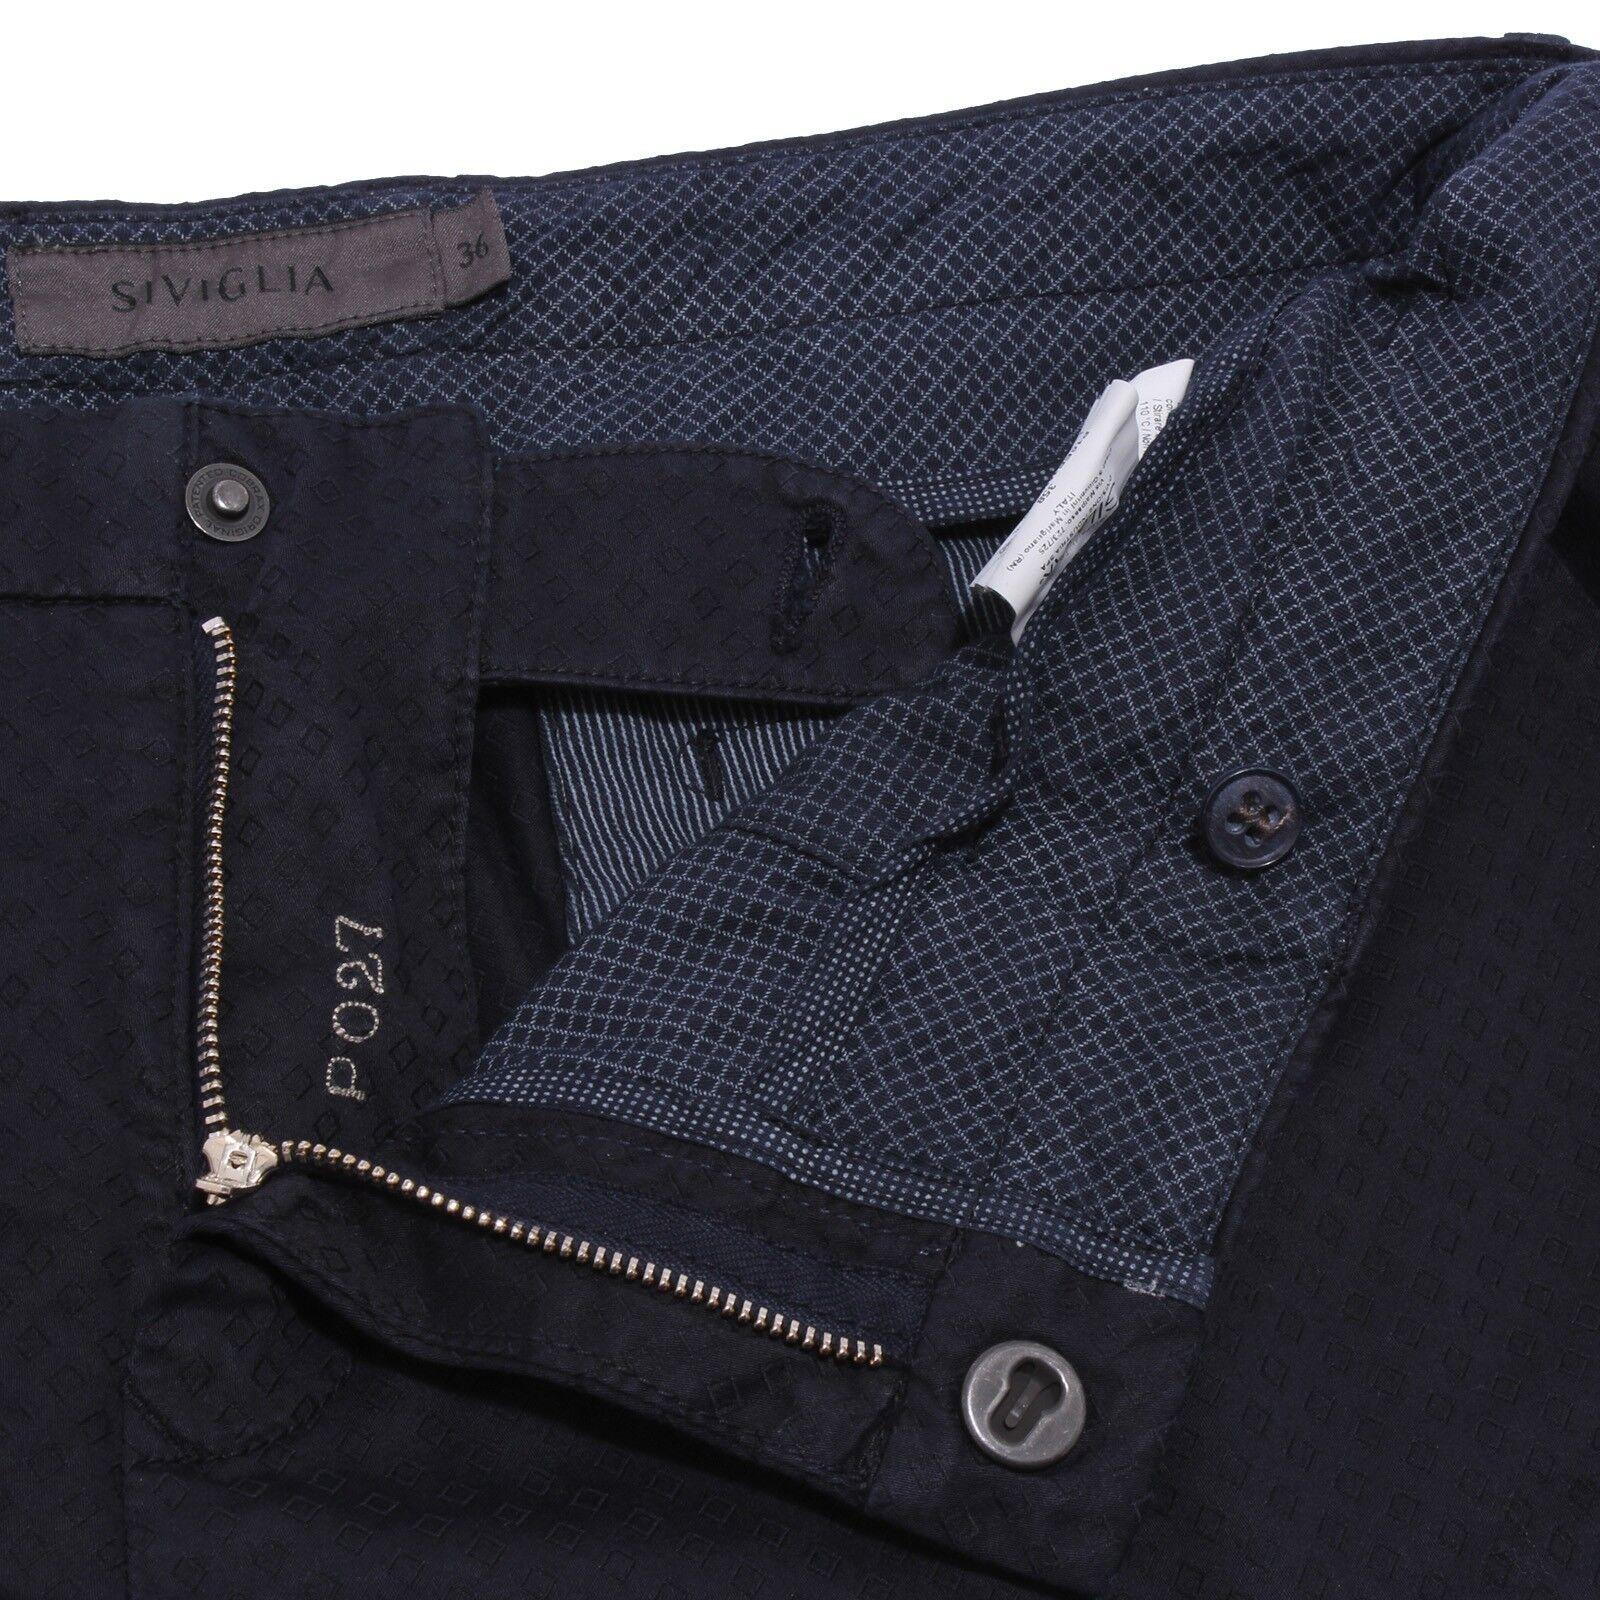 6358Y pantalone pantalone pantalone uomo blu SIVIGLIA SCRATCHED SPOTTED cotton trouser man d752ed